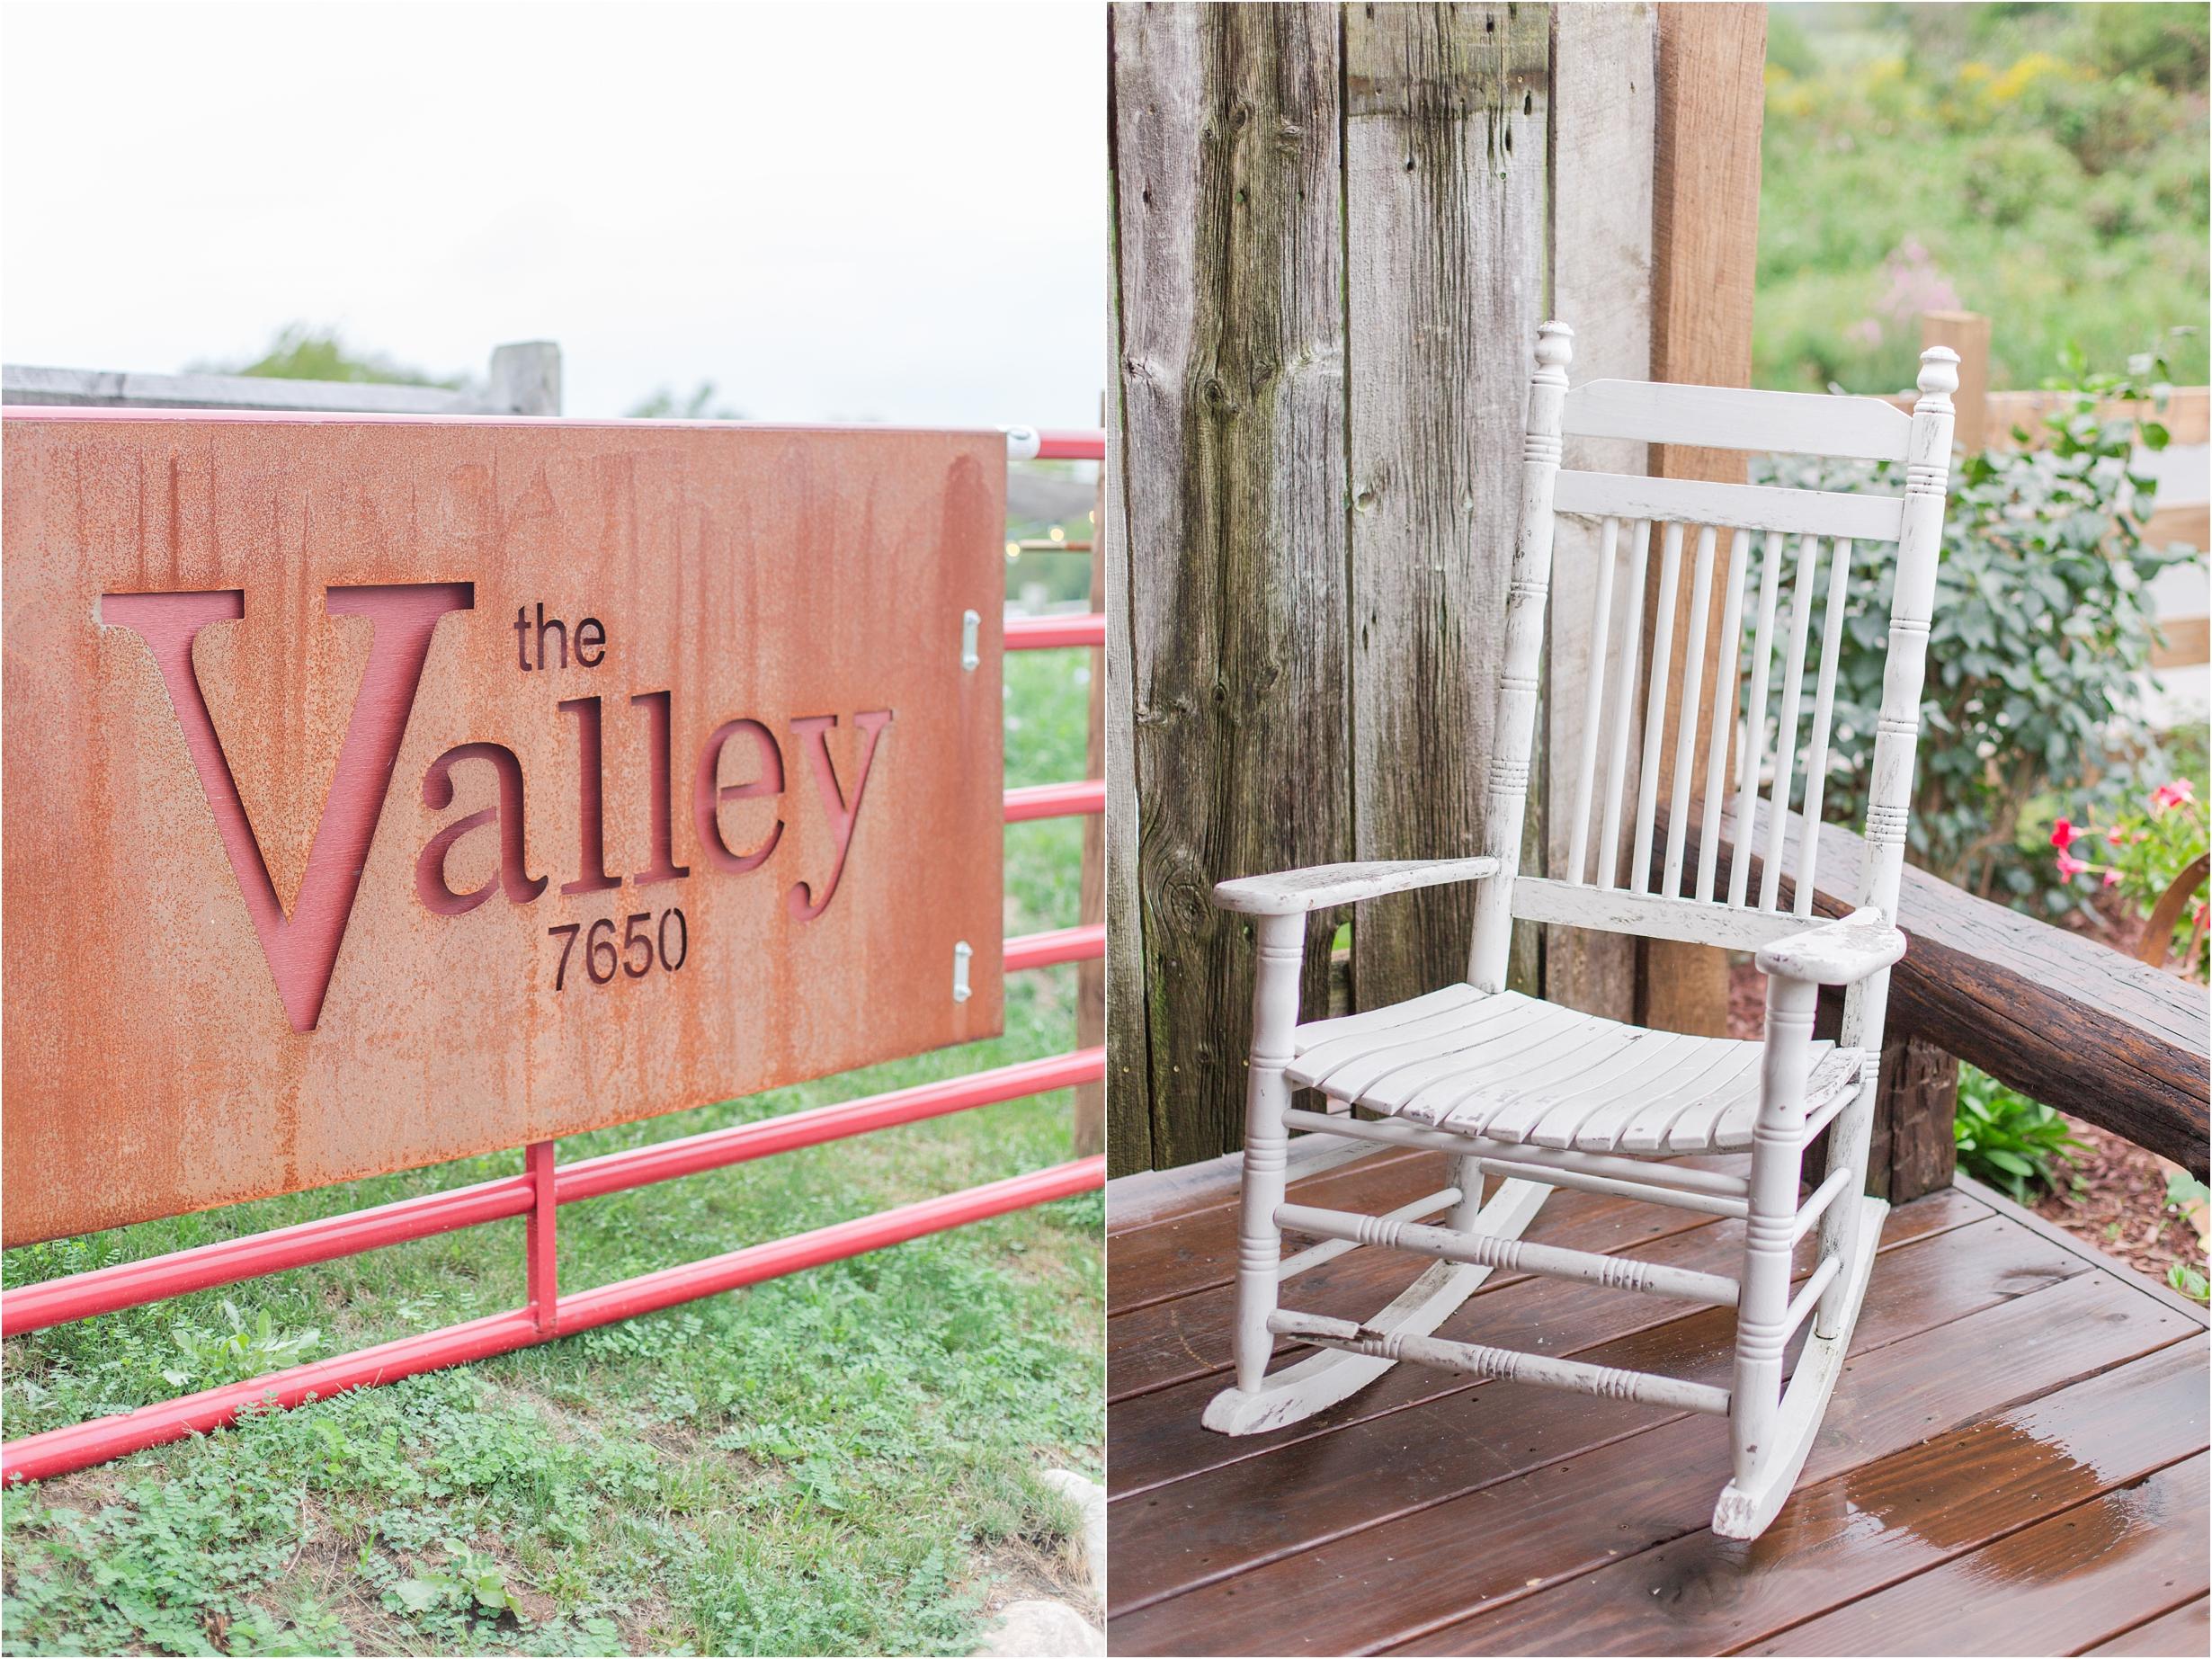 romantic-timeless-candid-wedding-photos-at-the-valley-frutig-farms-in-ann-arbor-mi-by-courtney-carolyn-photography_0001.jpg